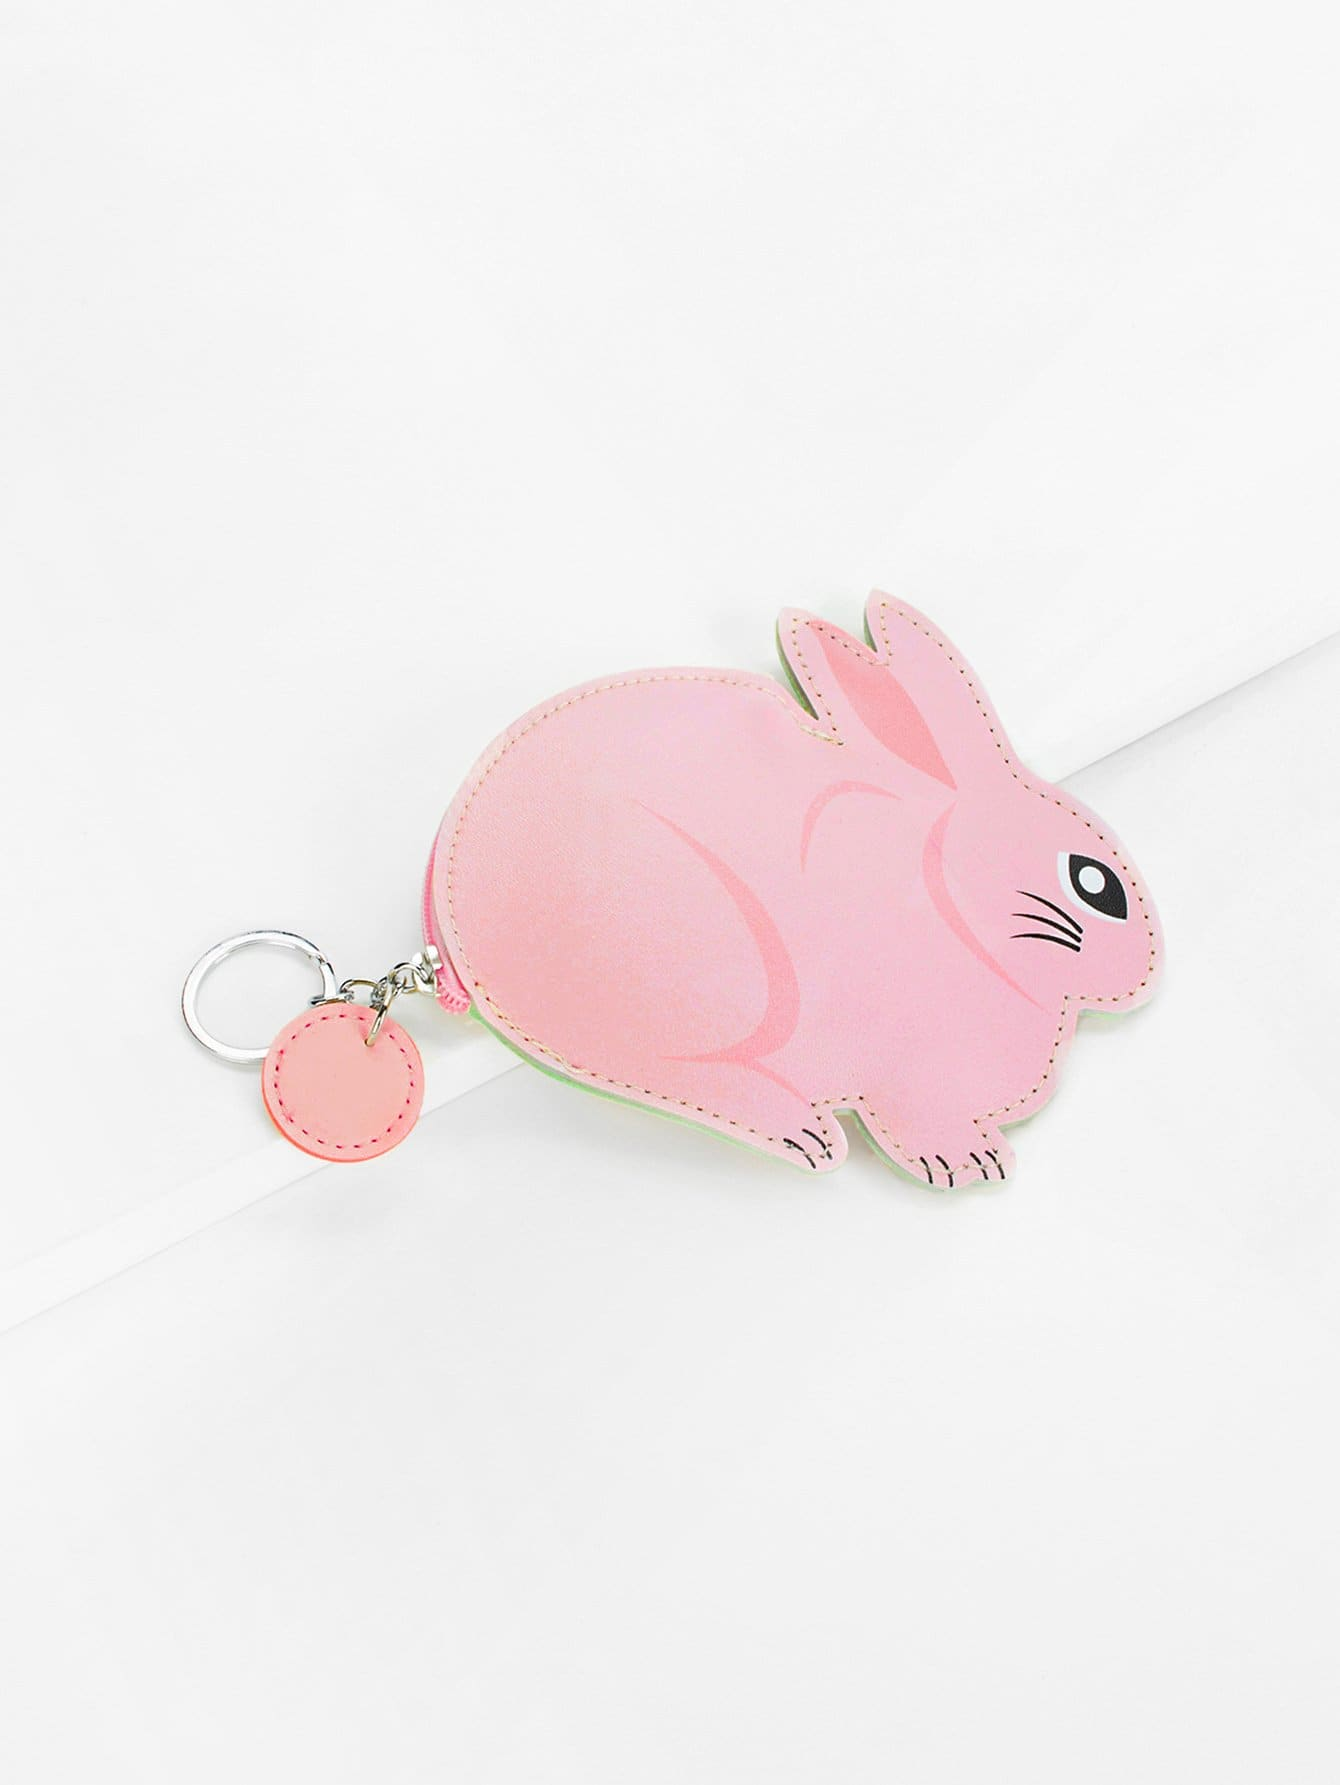 Rabbit Shaped Coin Purse 2017 cute girls coin purses small coin bag key ring kawaii bag kids mini wallet card holders leather cartoon coin purse1bw73